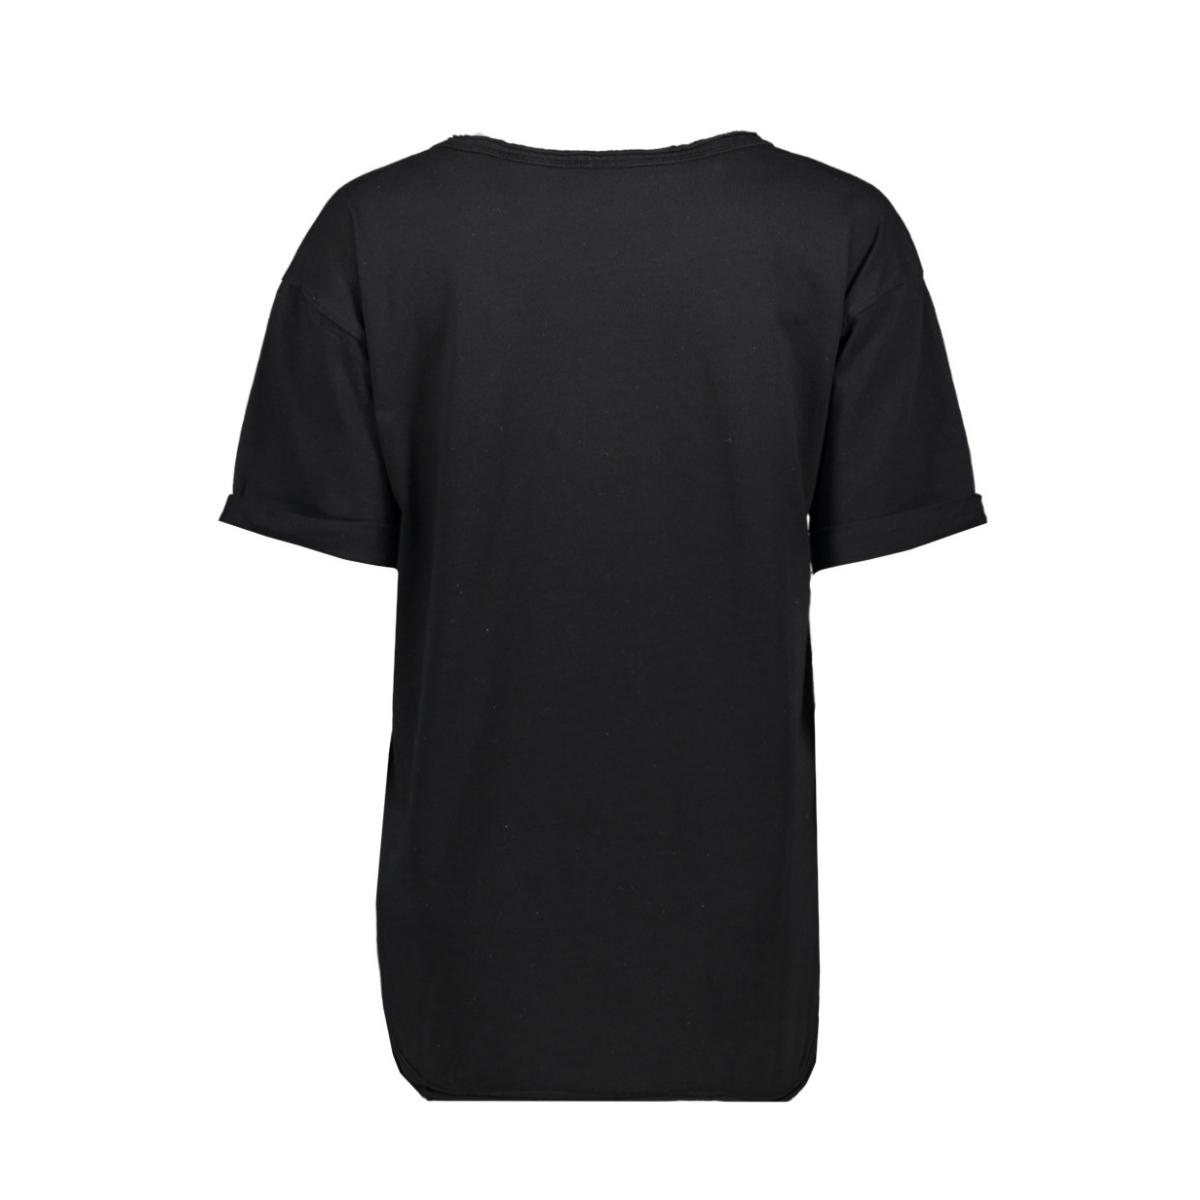 shortsleeve tee 20 747 9101 10 days t-shirt black